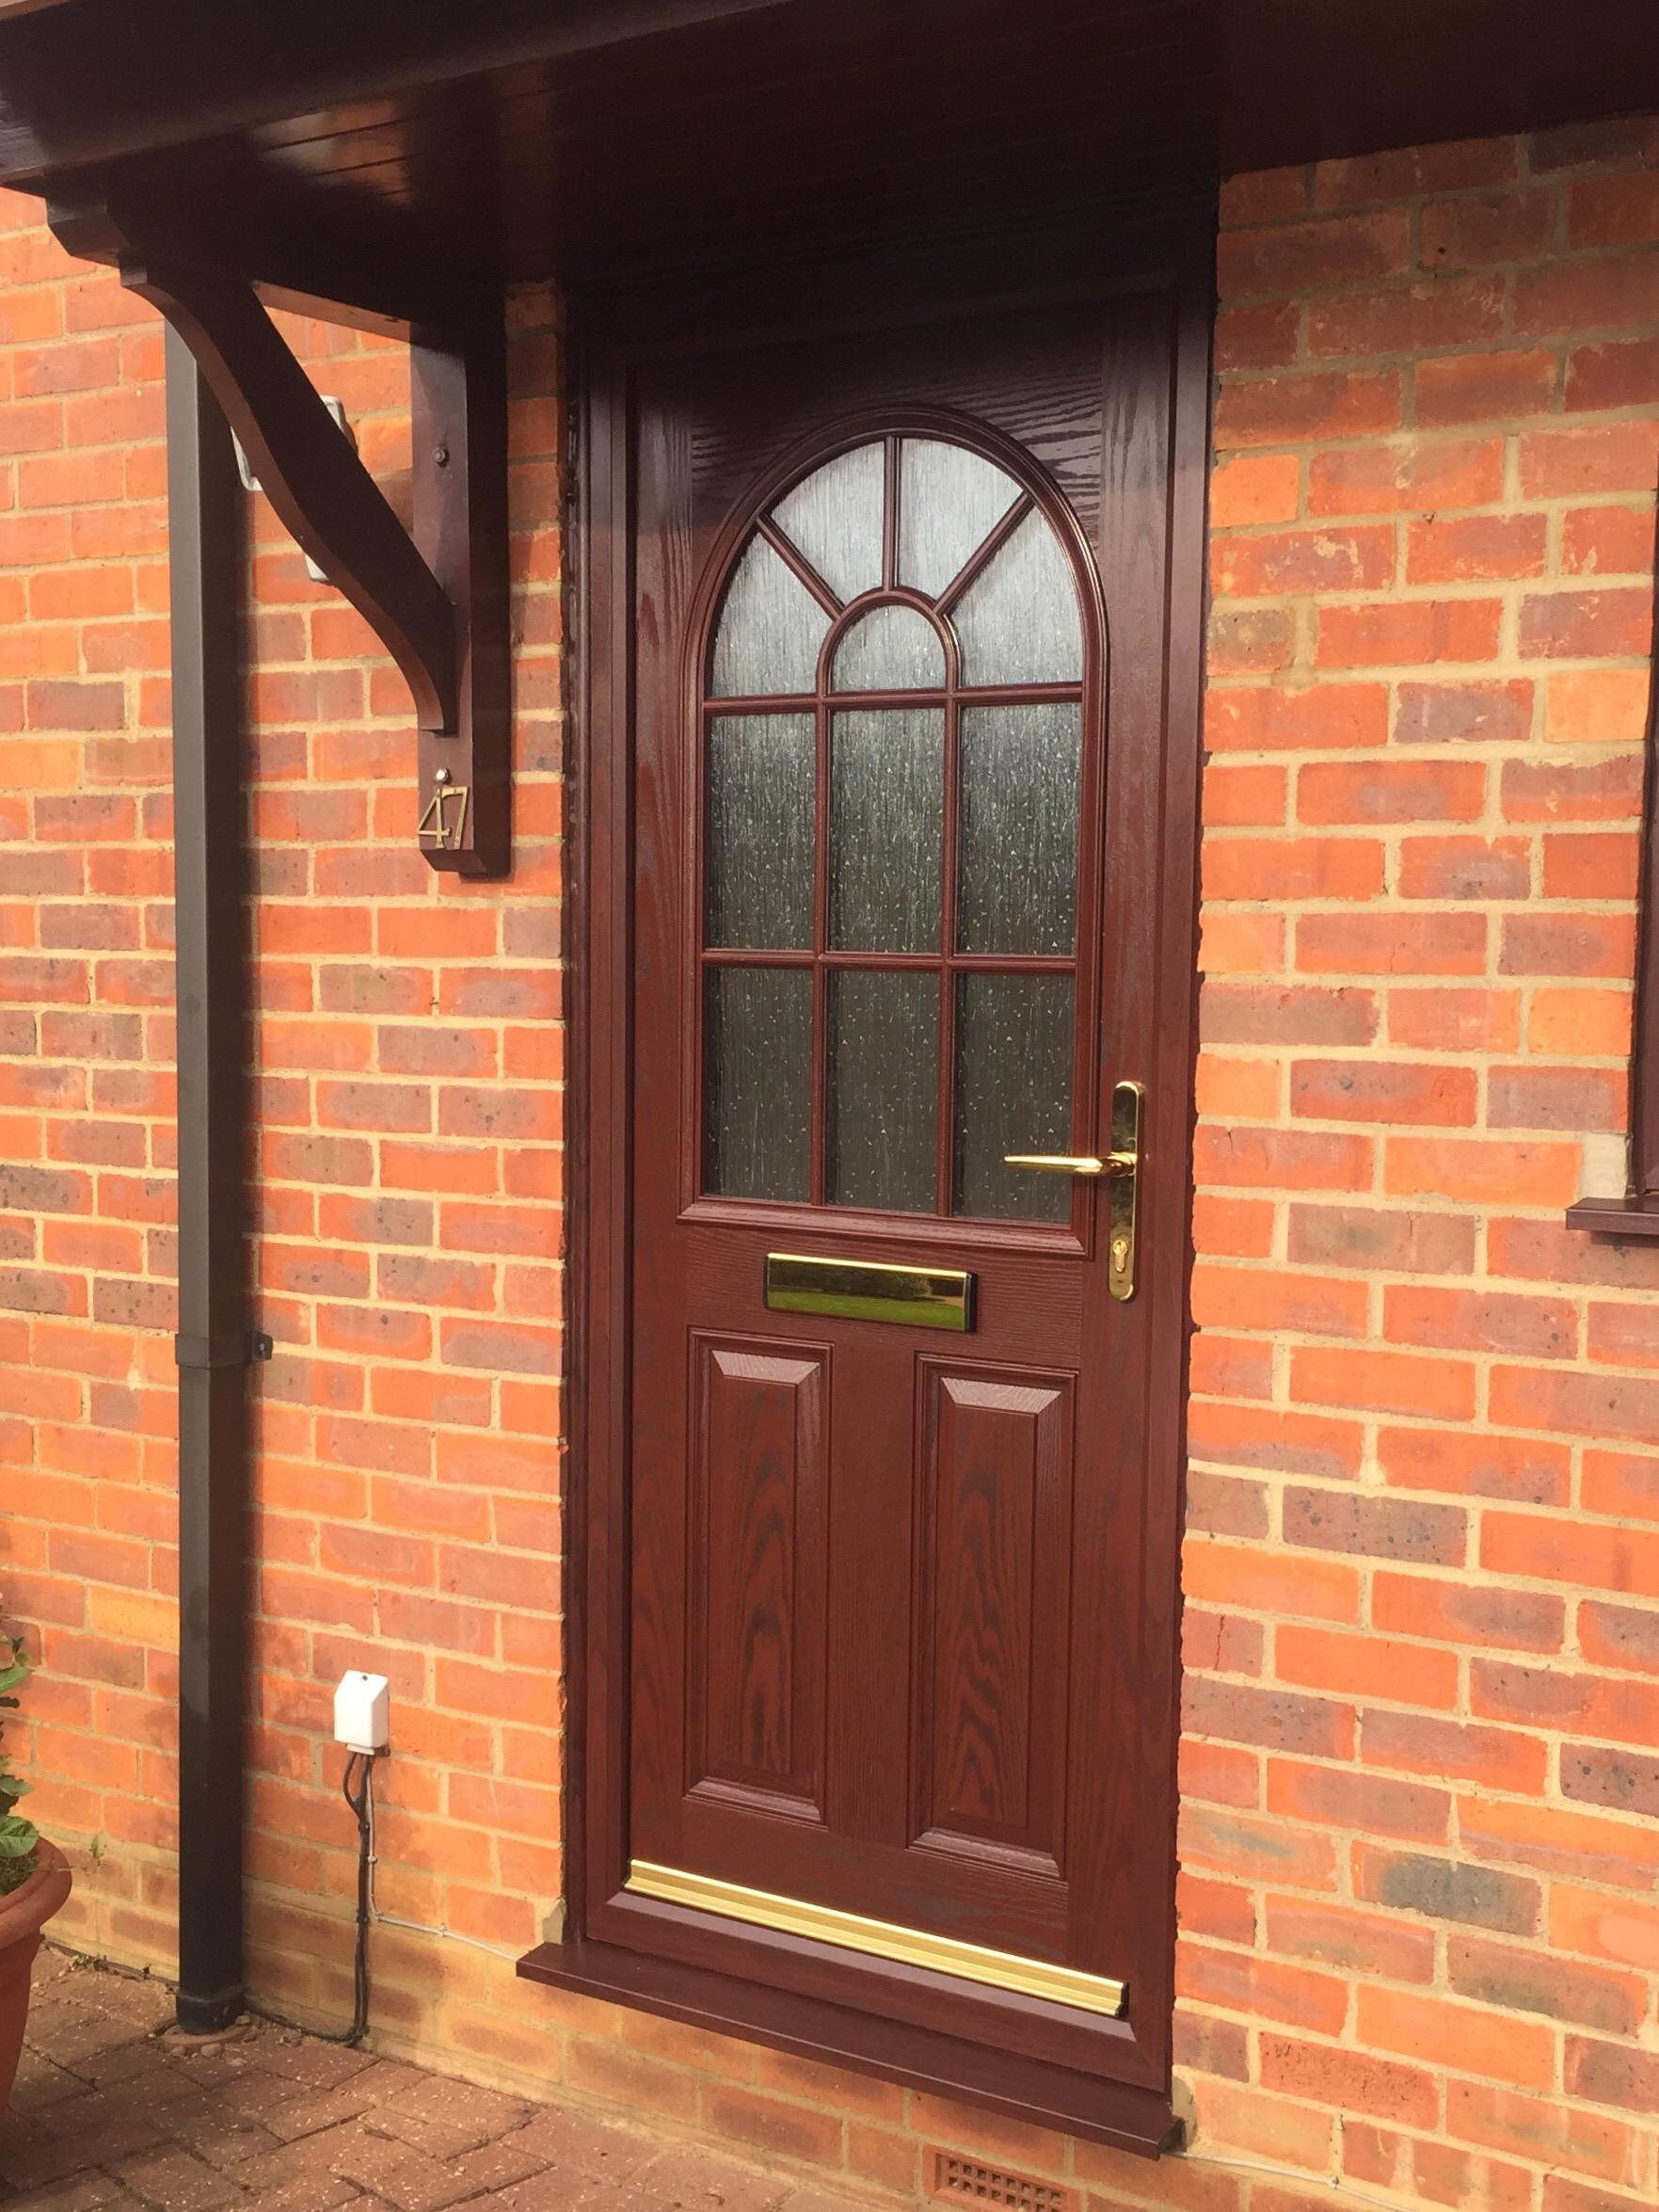 Rosewood composite door & Rosewood composite door | Neil Amos Windows